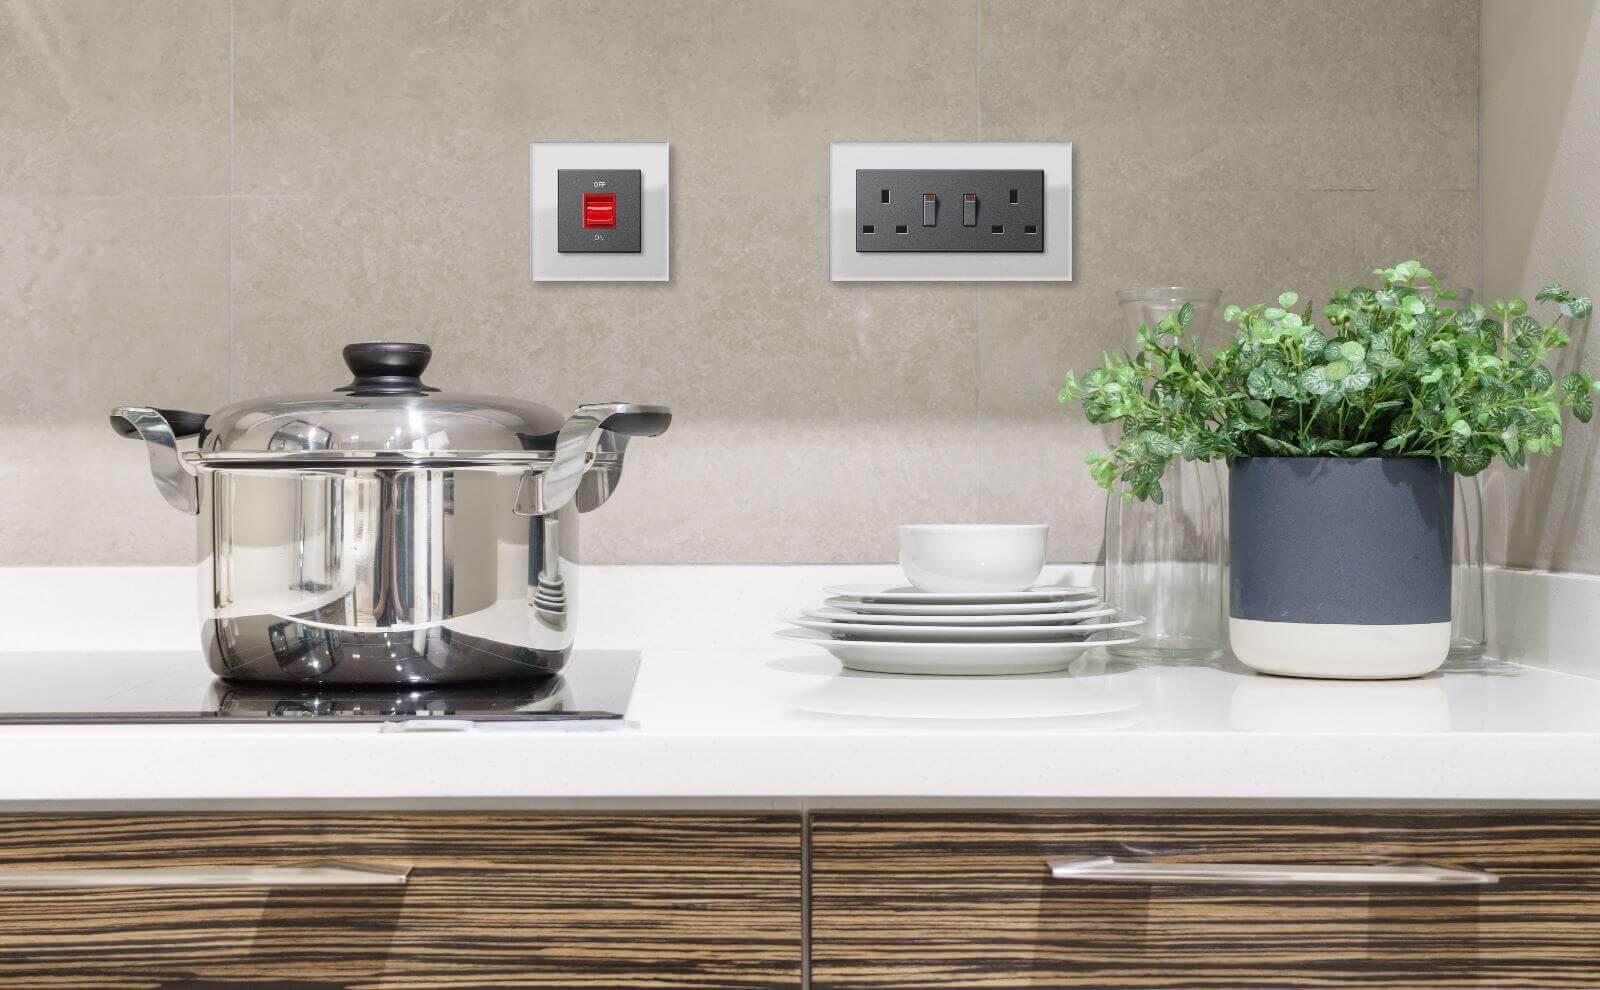 Gira E2 UK Steckdosen in der Küche